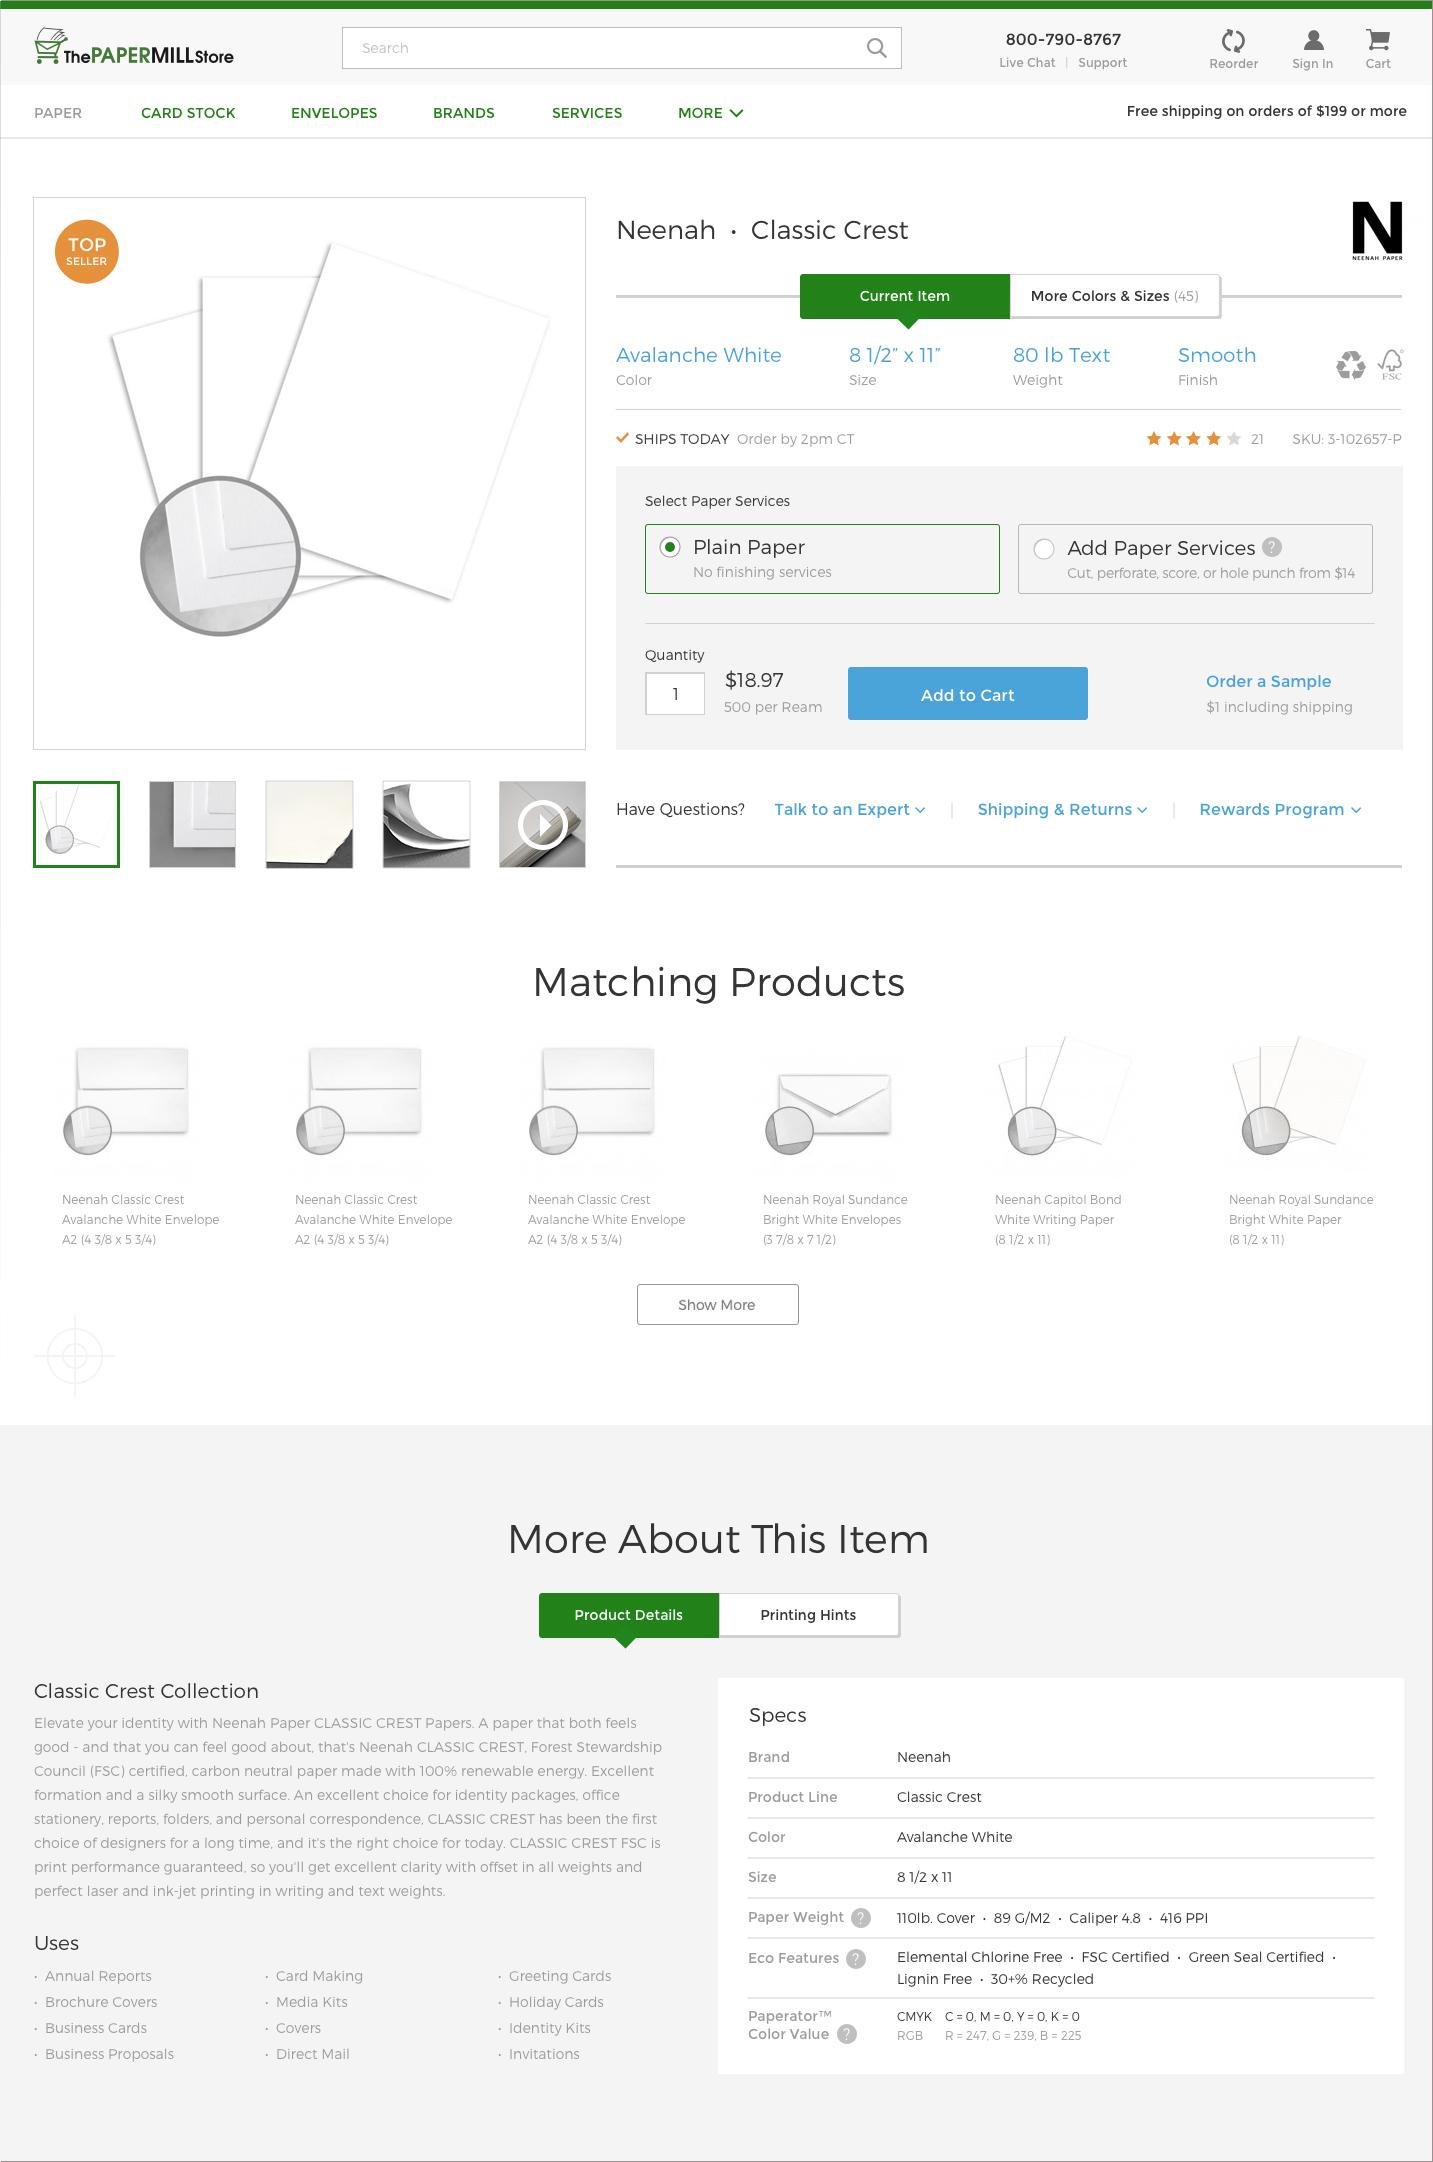 TPMS_Product_Detail.jpg